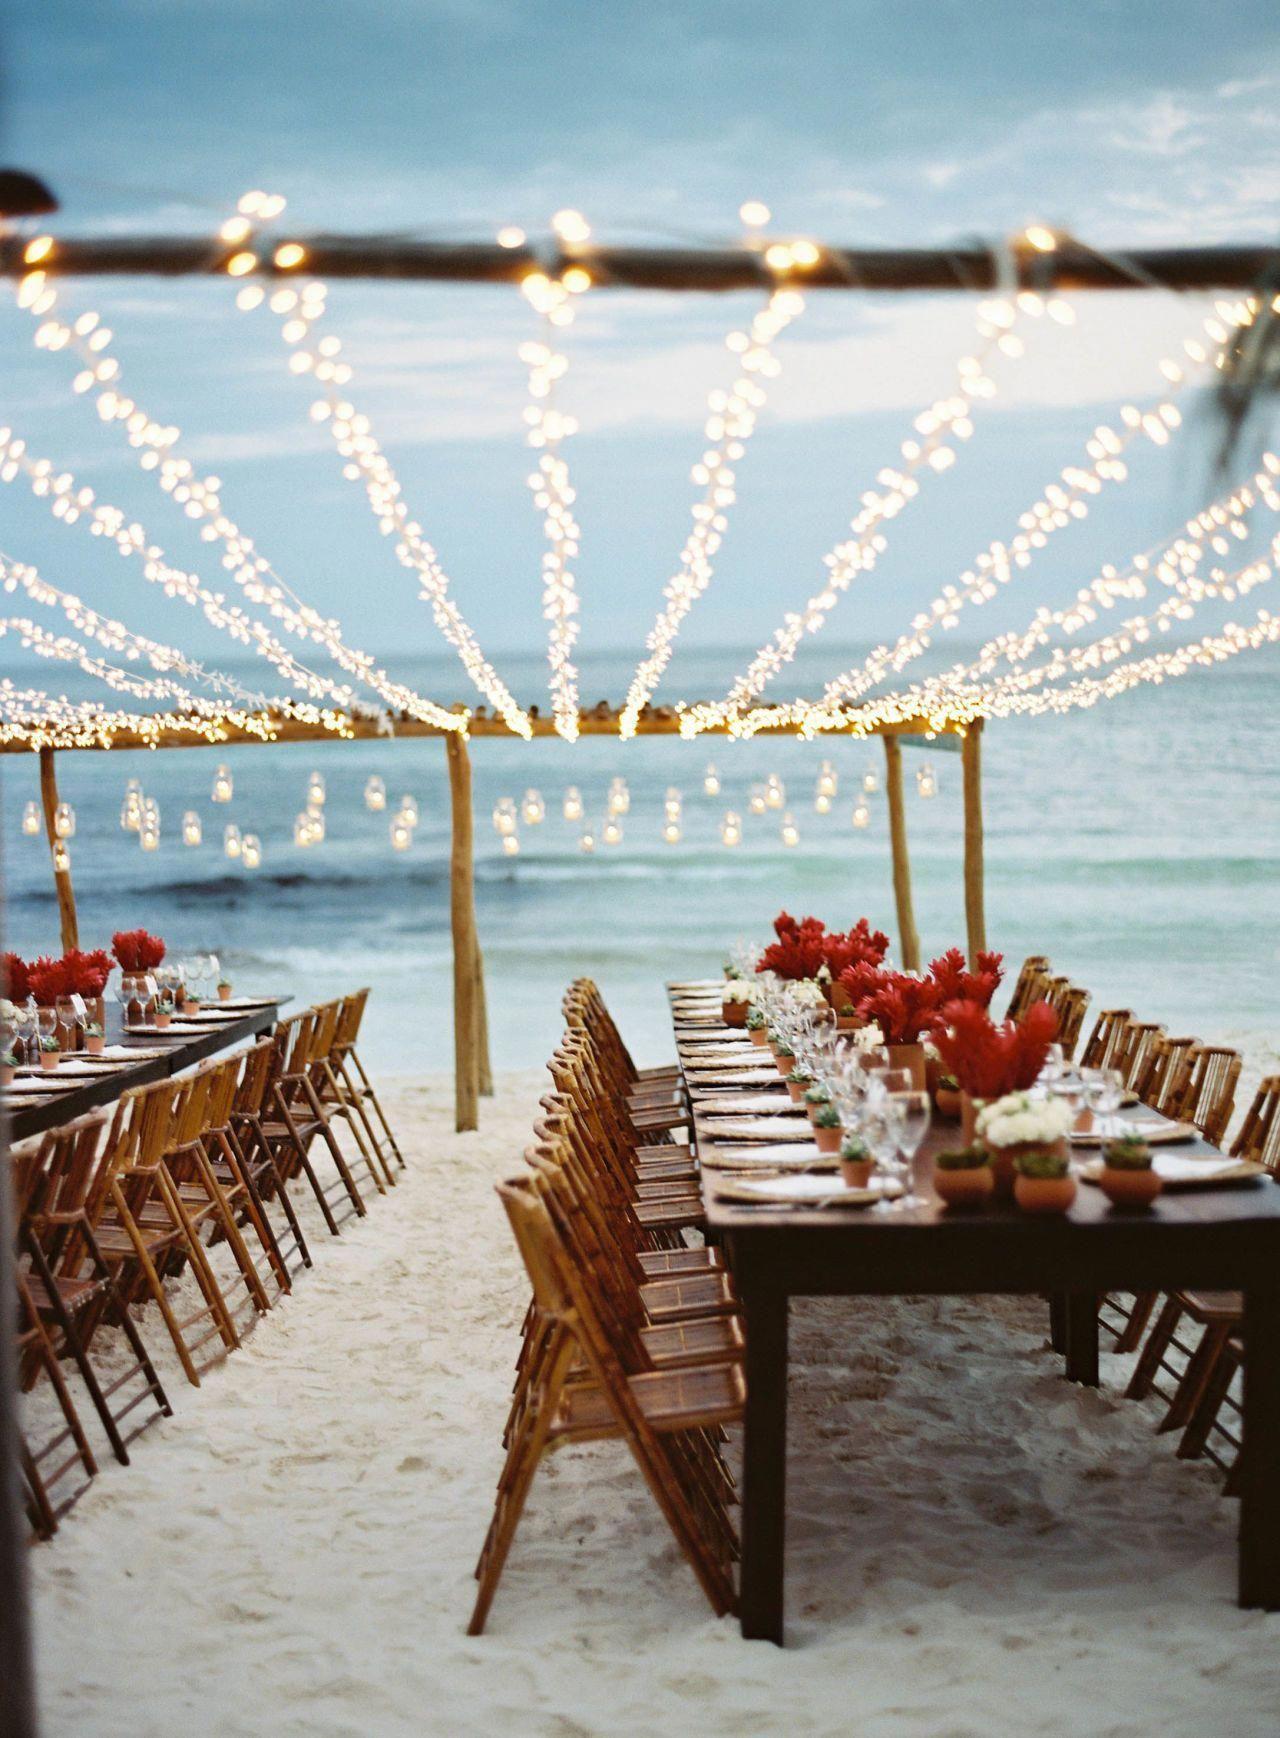 The Most Idyllic Beach Wedding